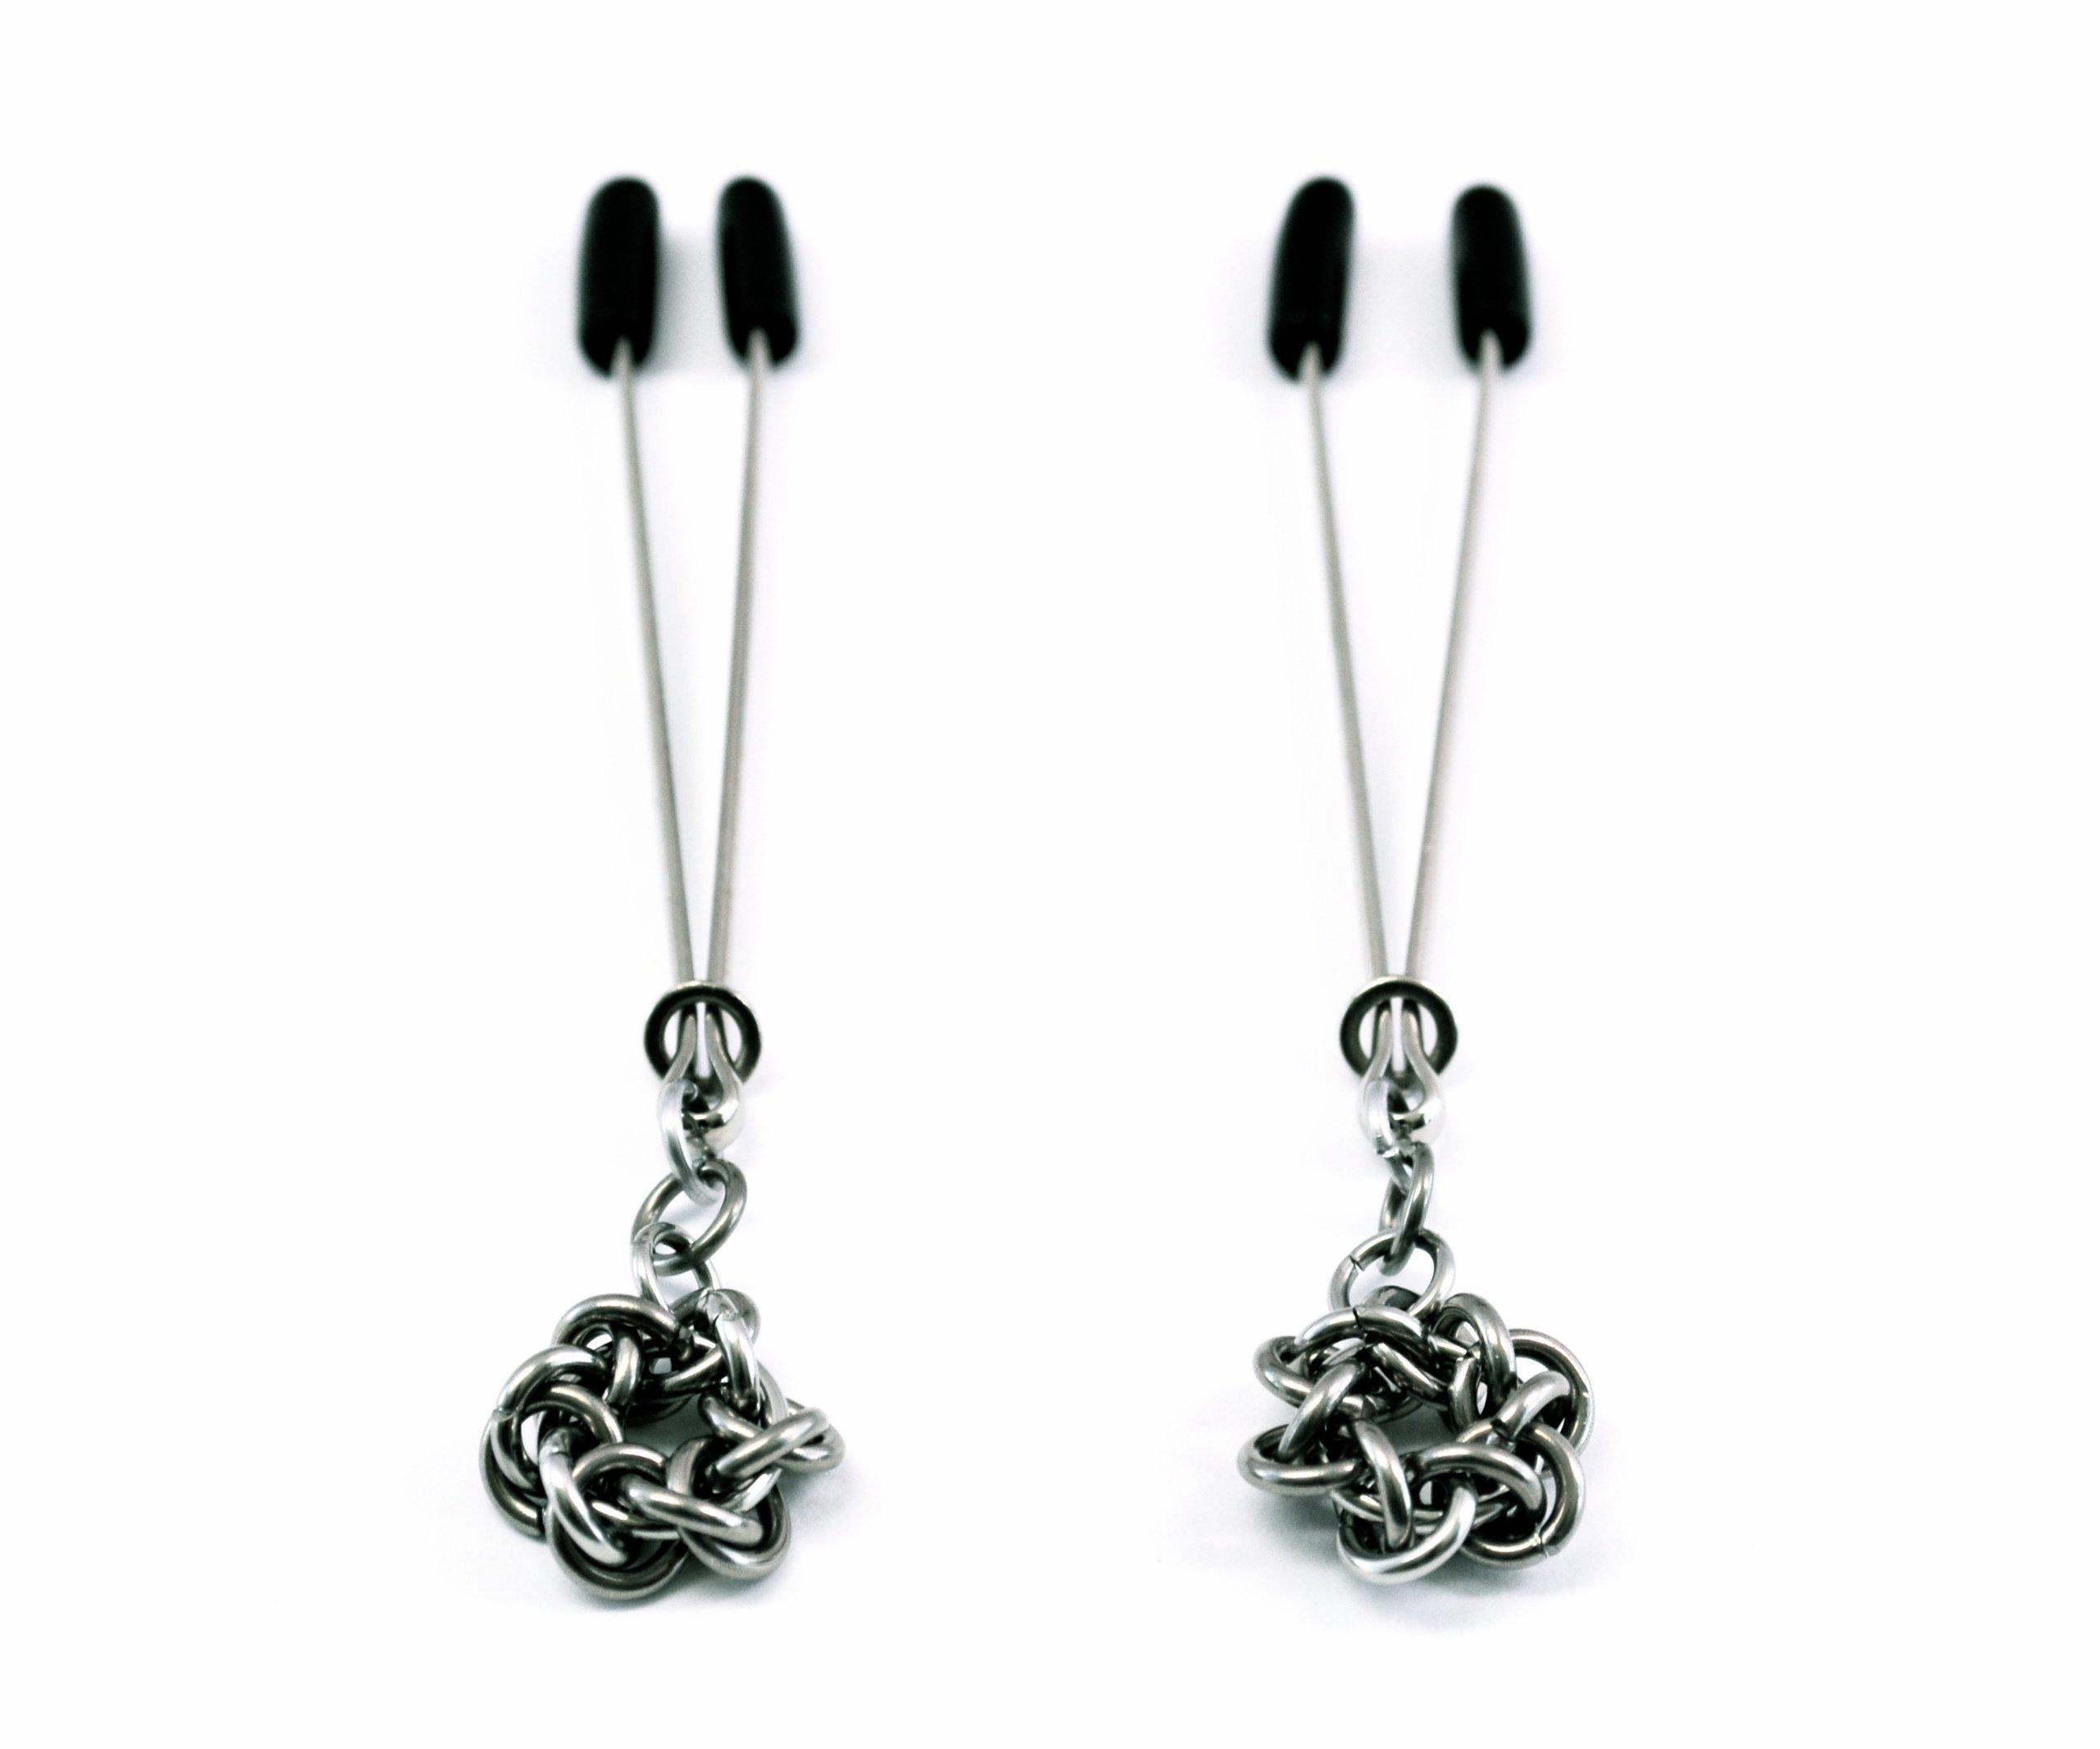 Pair of Twisting Star Amulet Nipple Clips | Designer Nipple Bondage Restraint Jewelry | by Sade Fantasy by Sade Fantasy